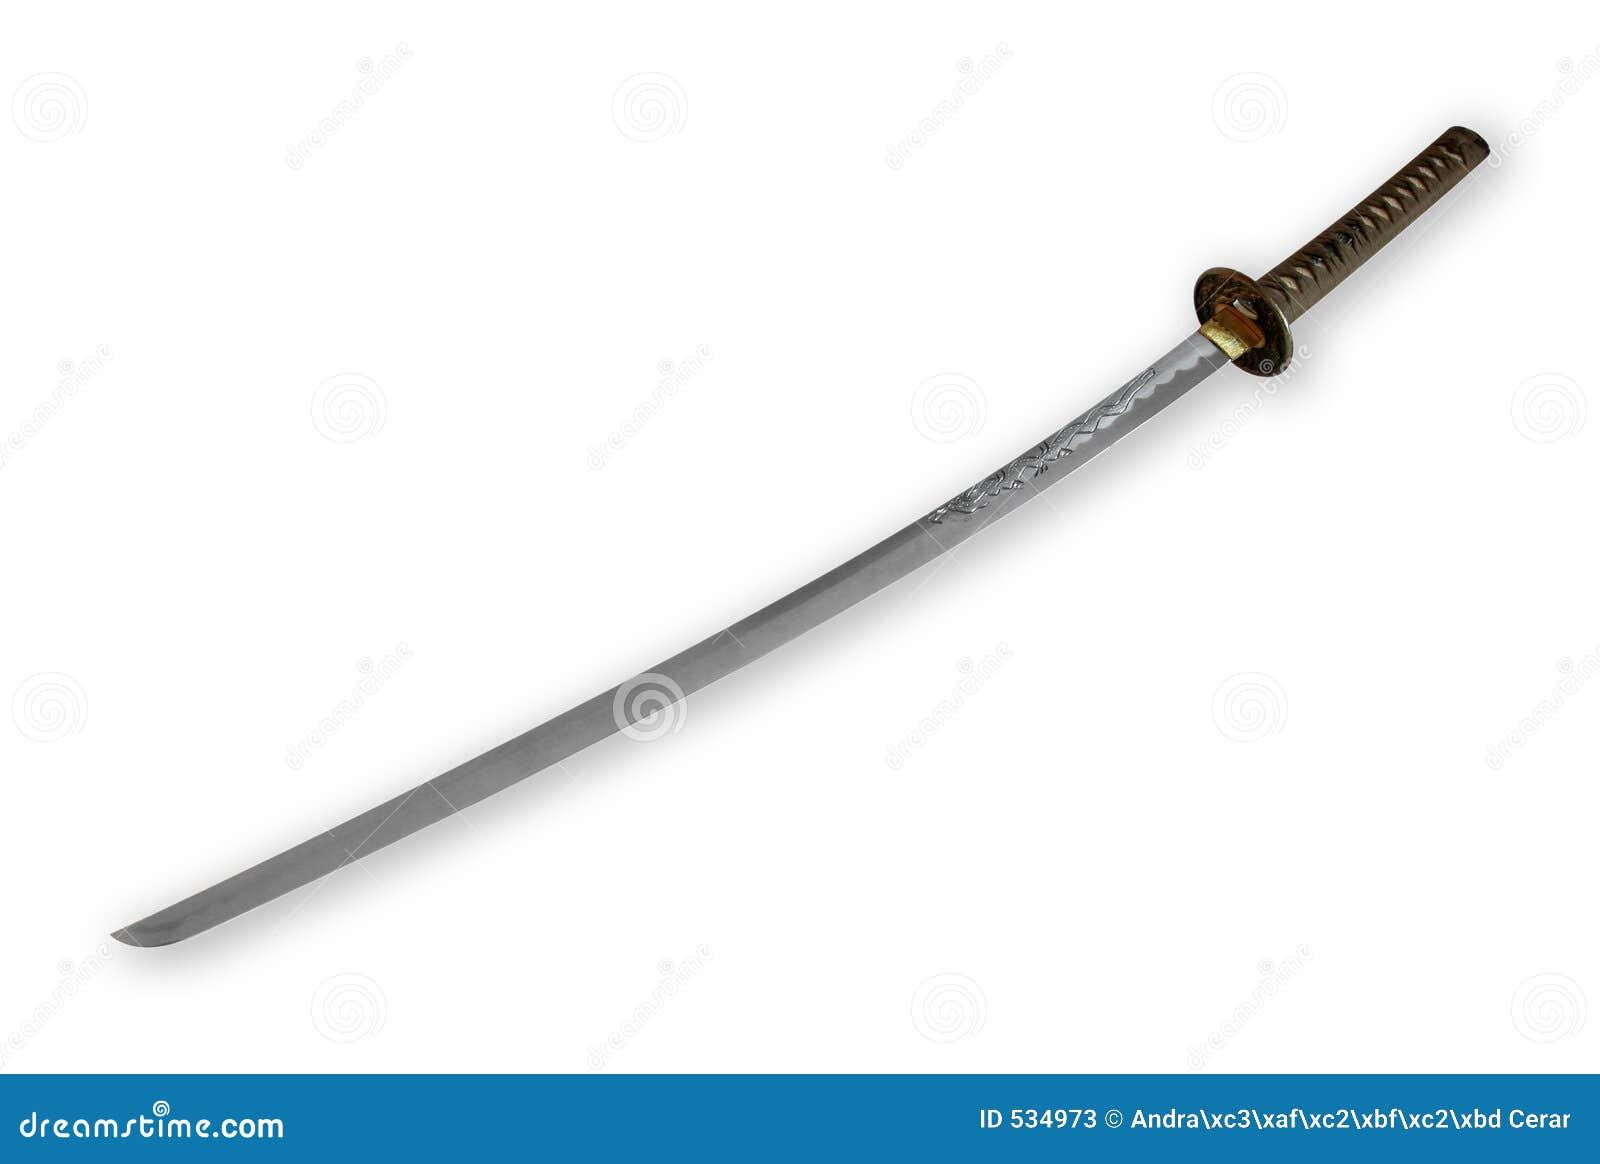 Samurai Sword Katana Stock Image Image Of China Friend